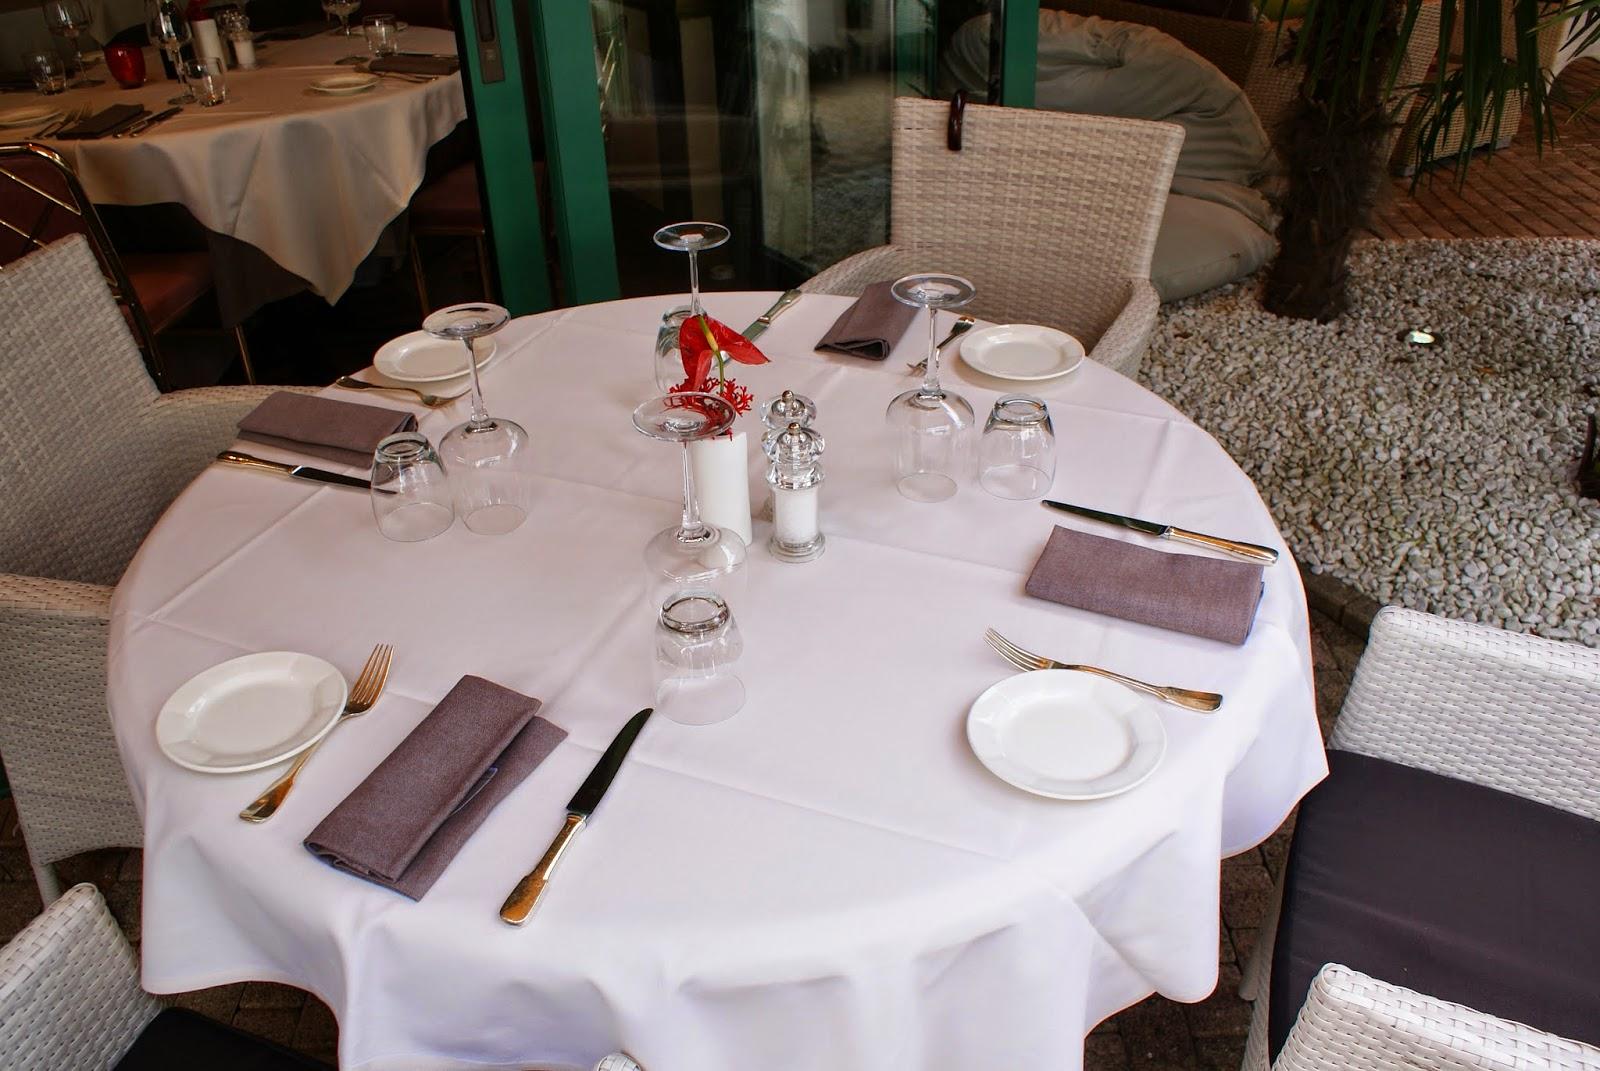 Restaurant Le Sinatra Porte De La Chapelle